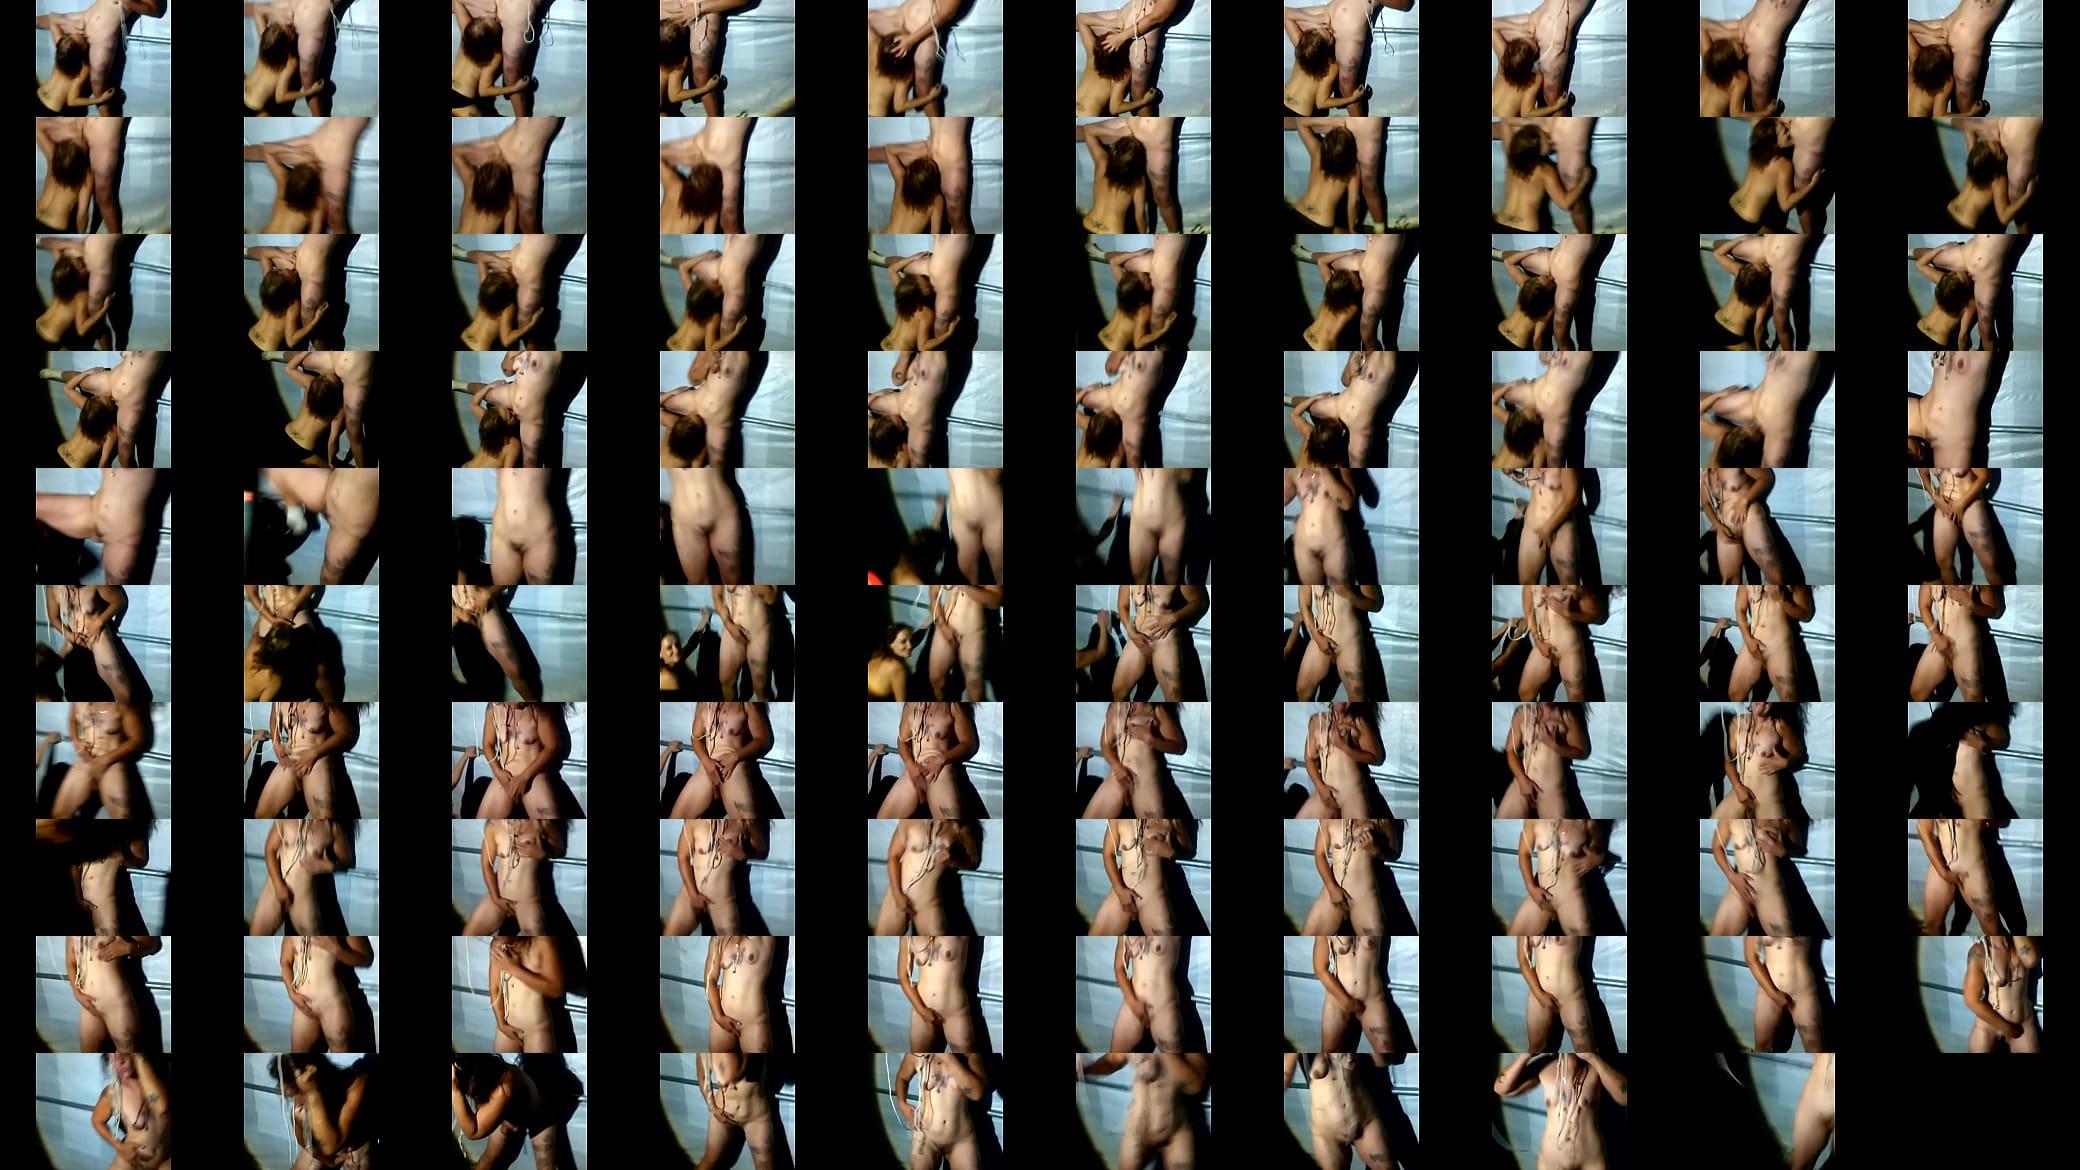 Axfisia Sexo Porno erotic stranglation - xvideos